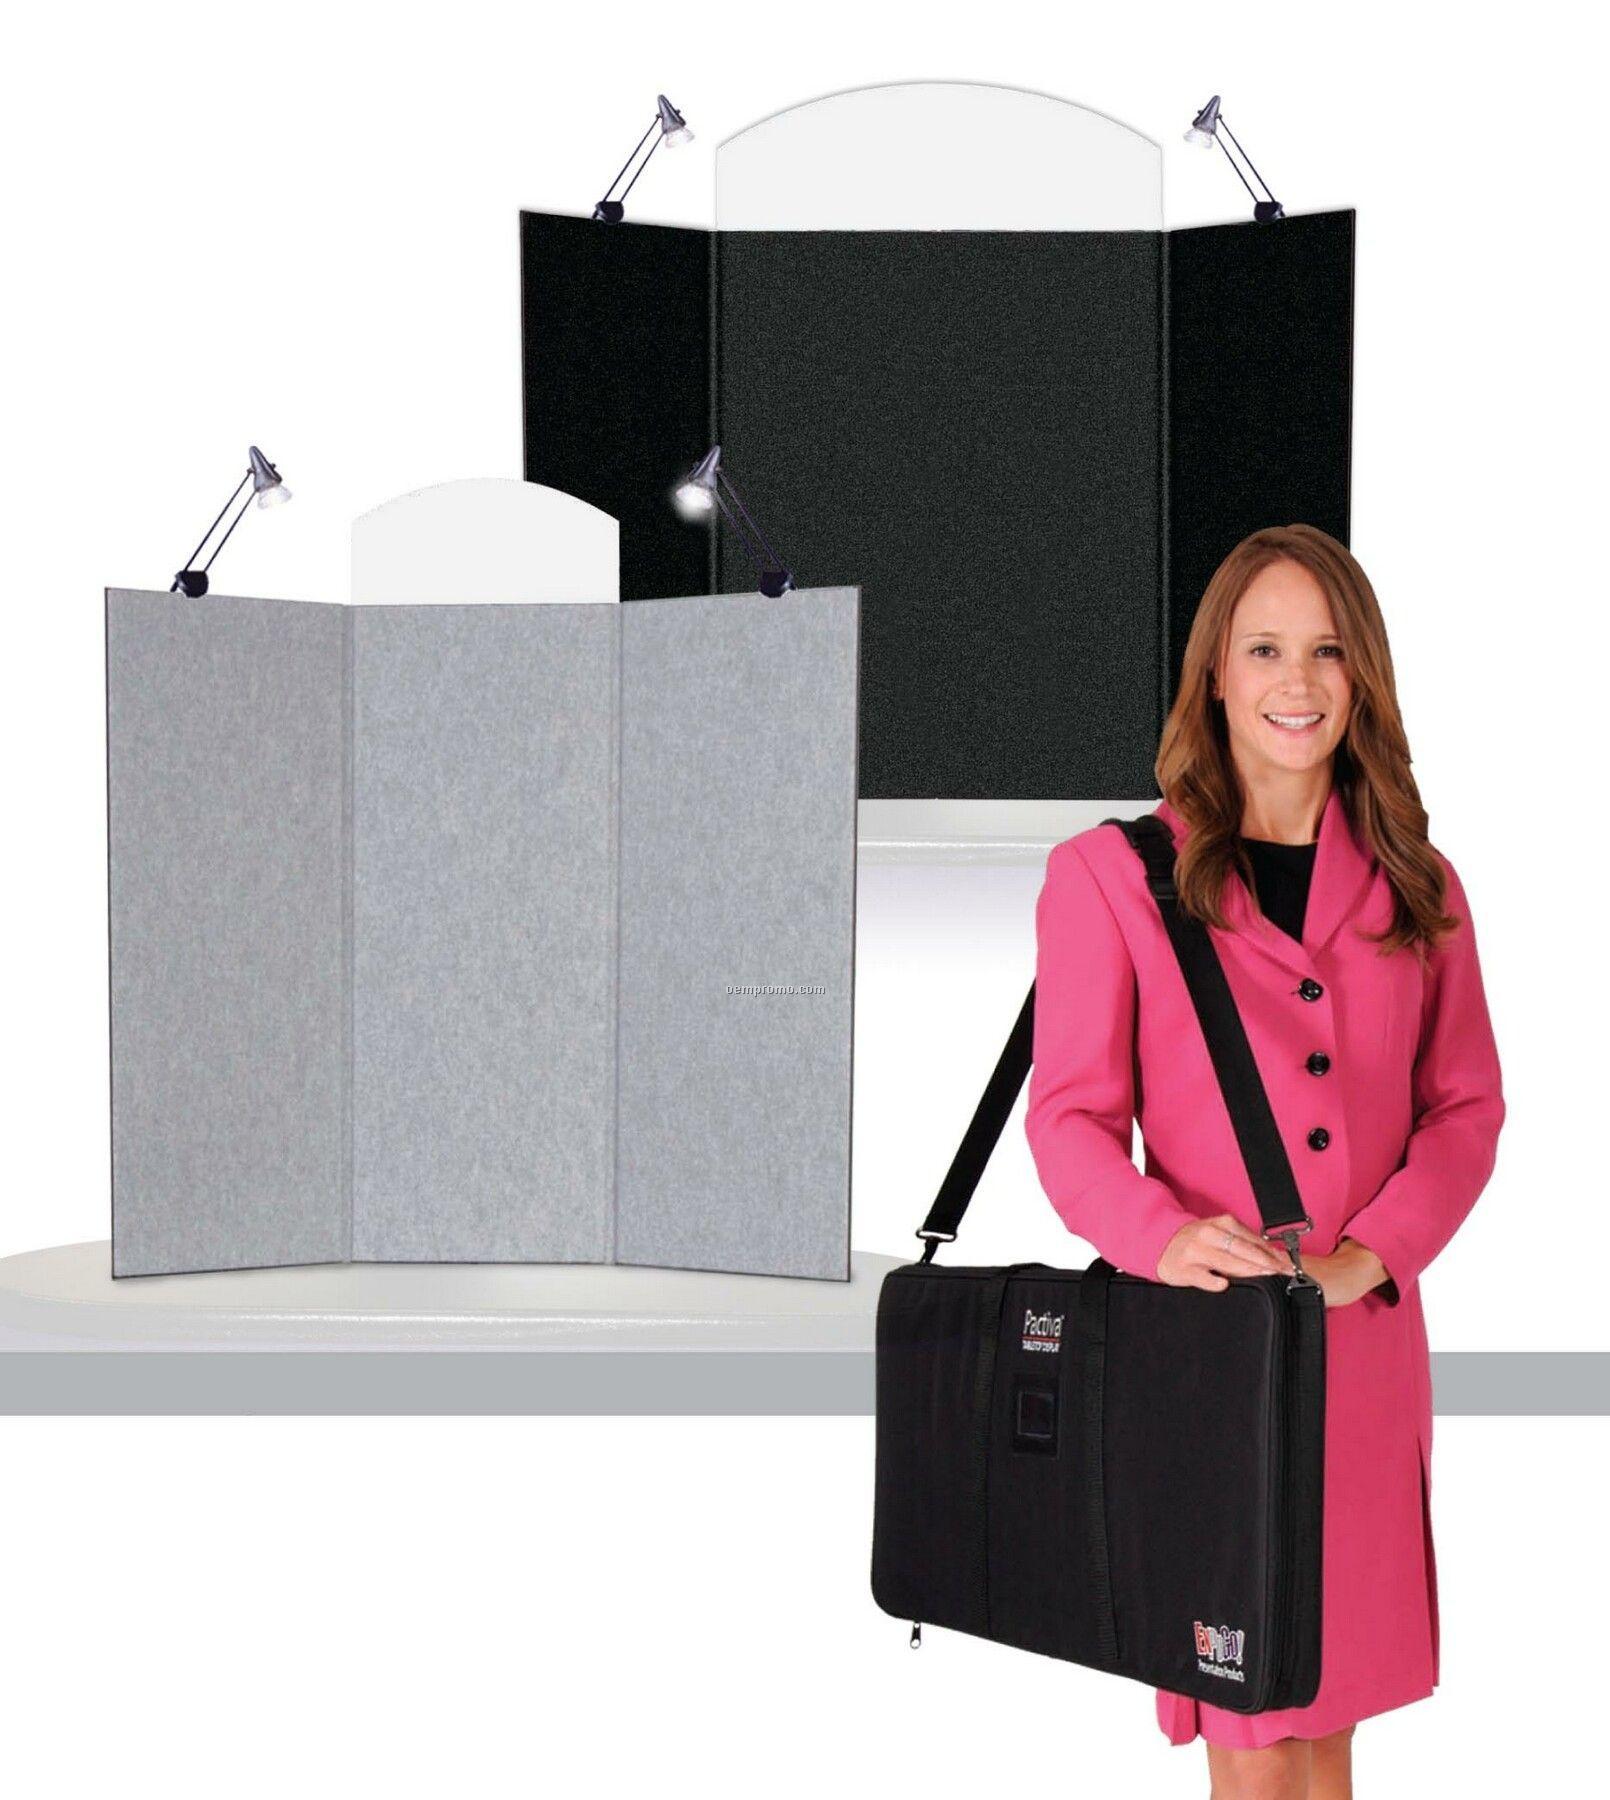 Pactiva 3 Panel Tabletop Display, Fabric Panels, Blank Header